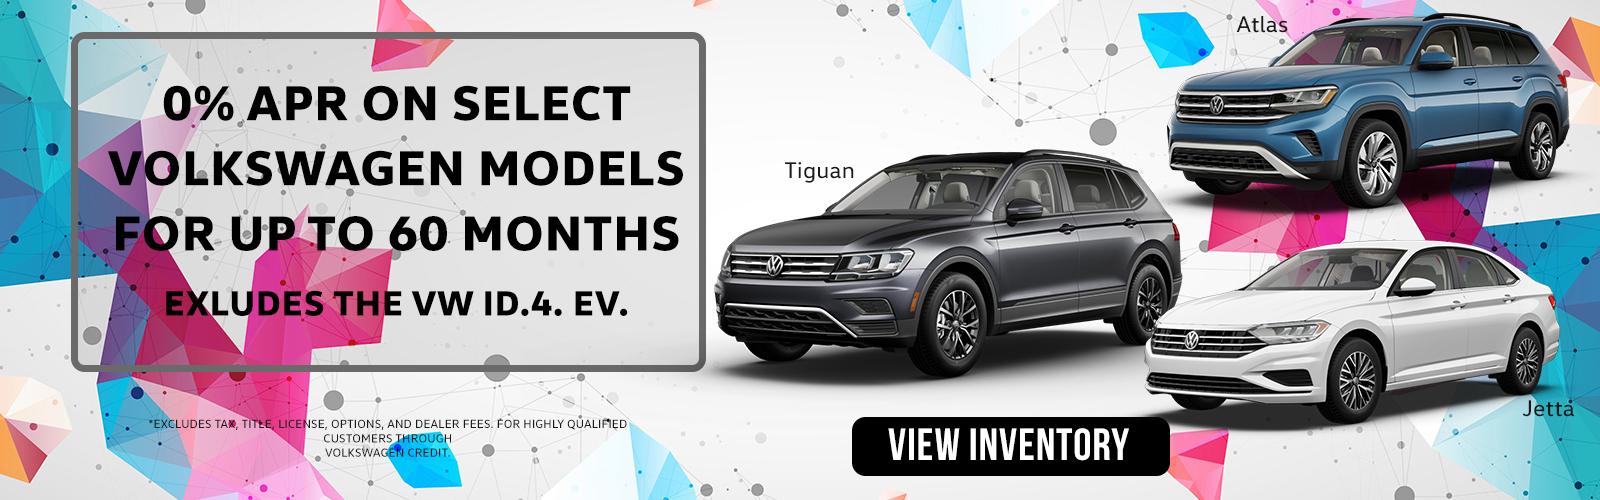 0% APR 60 months Ide VW